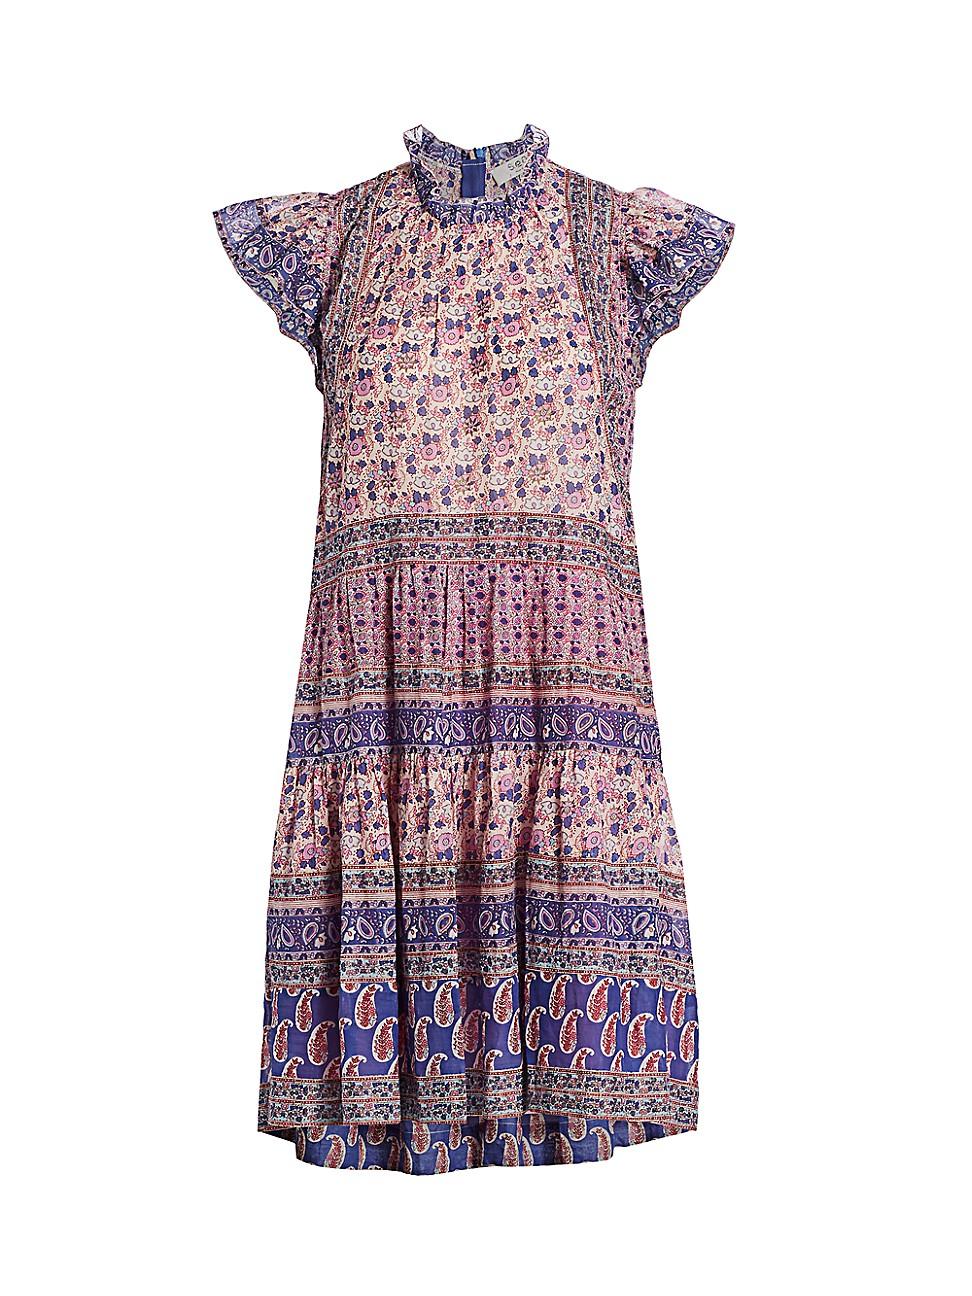 SEA WOMEN'S BIANCA BABYDOLL DRESS